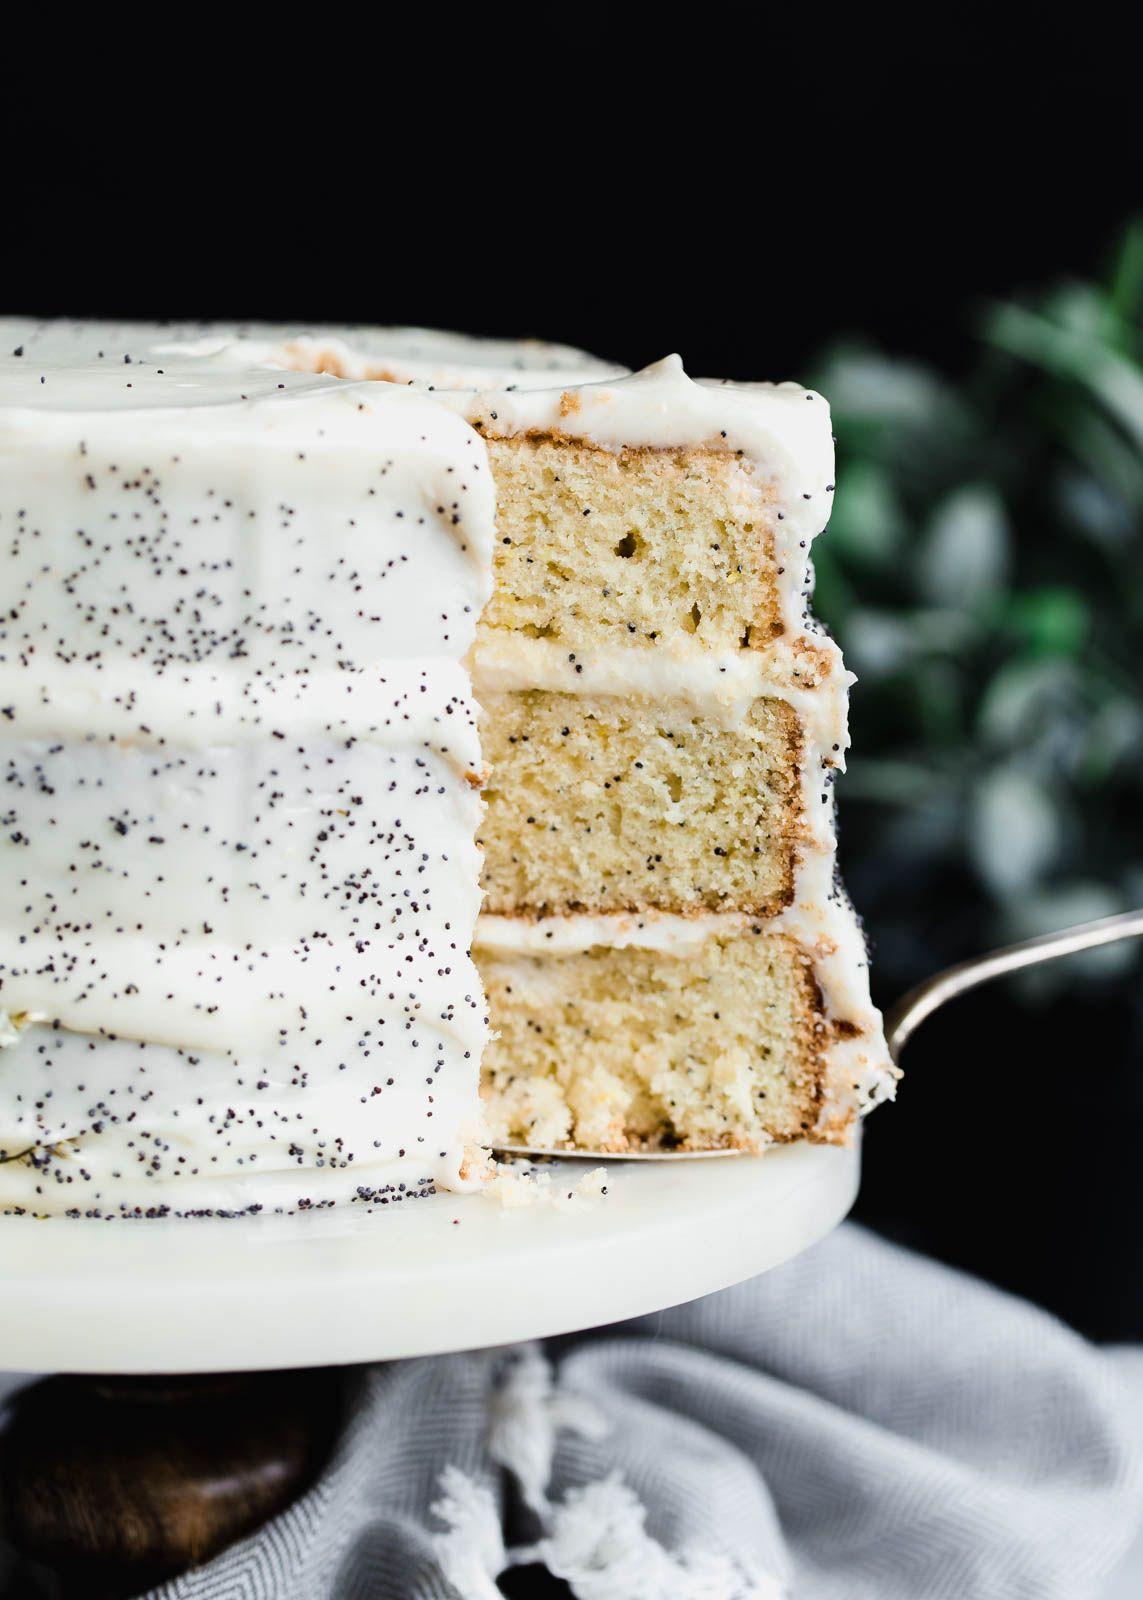 Lemon Poppy Seed Cake Broma Bakery Recipe Broma Bakery Lemon Poppyseed Cake Desserts